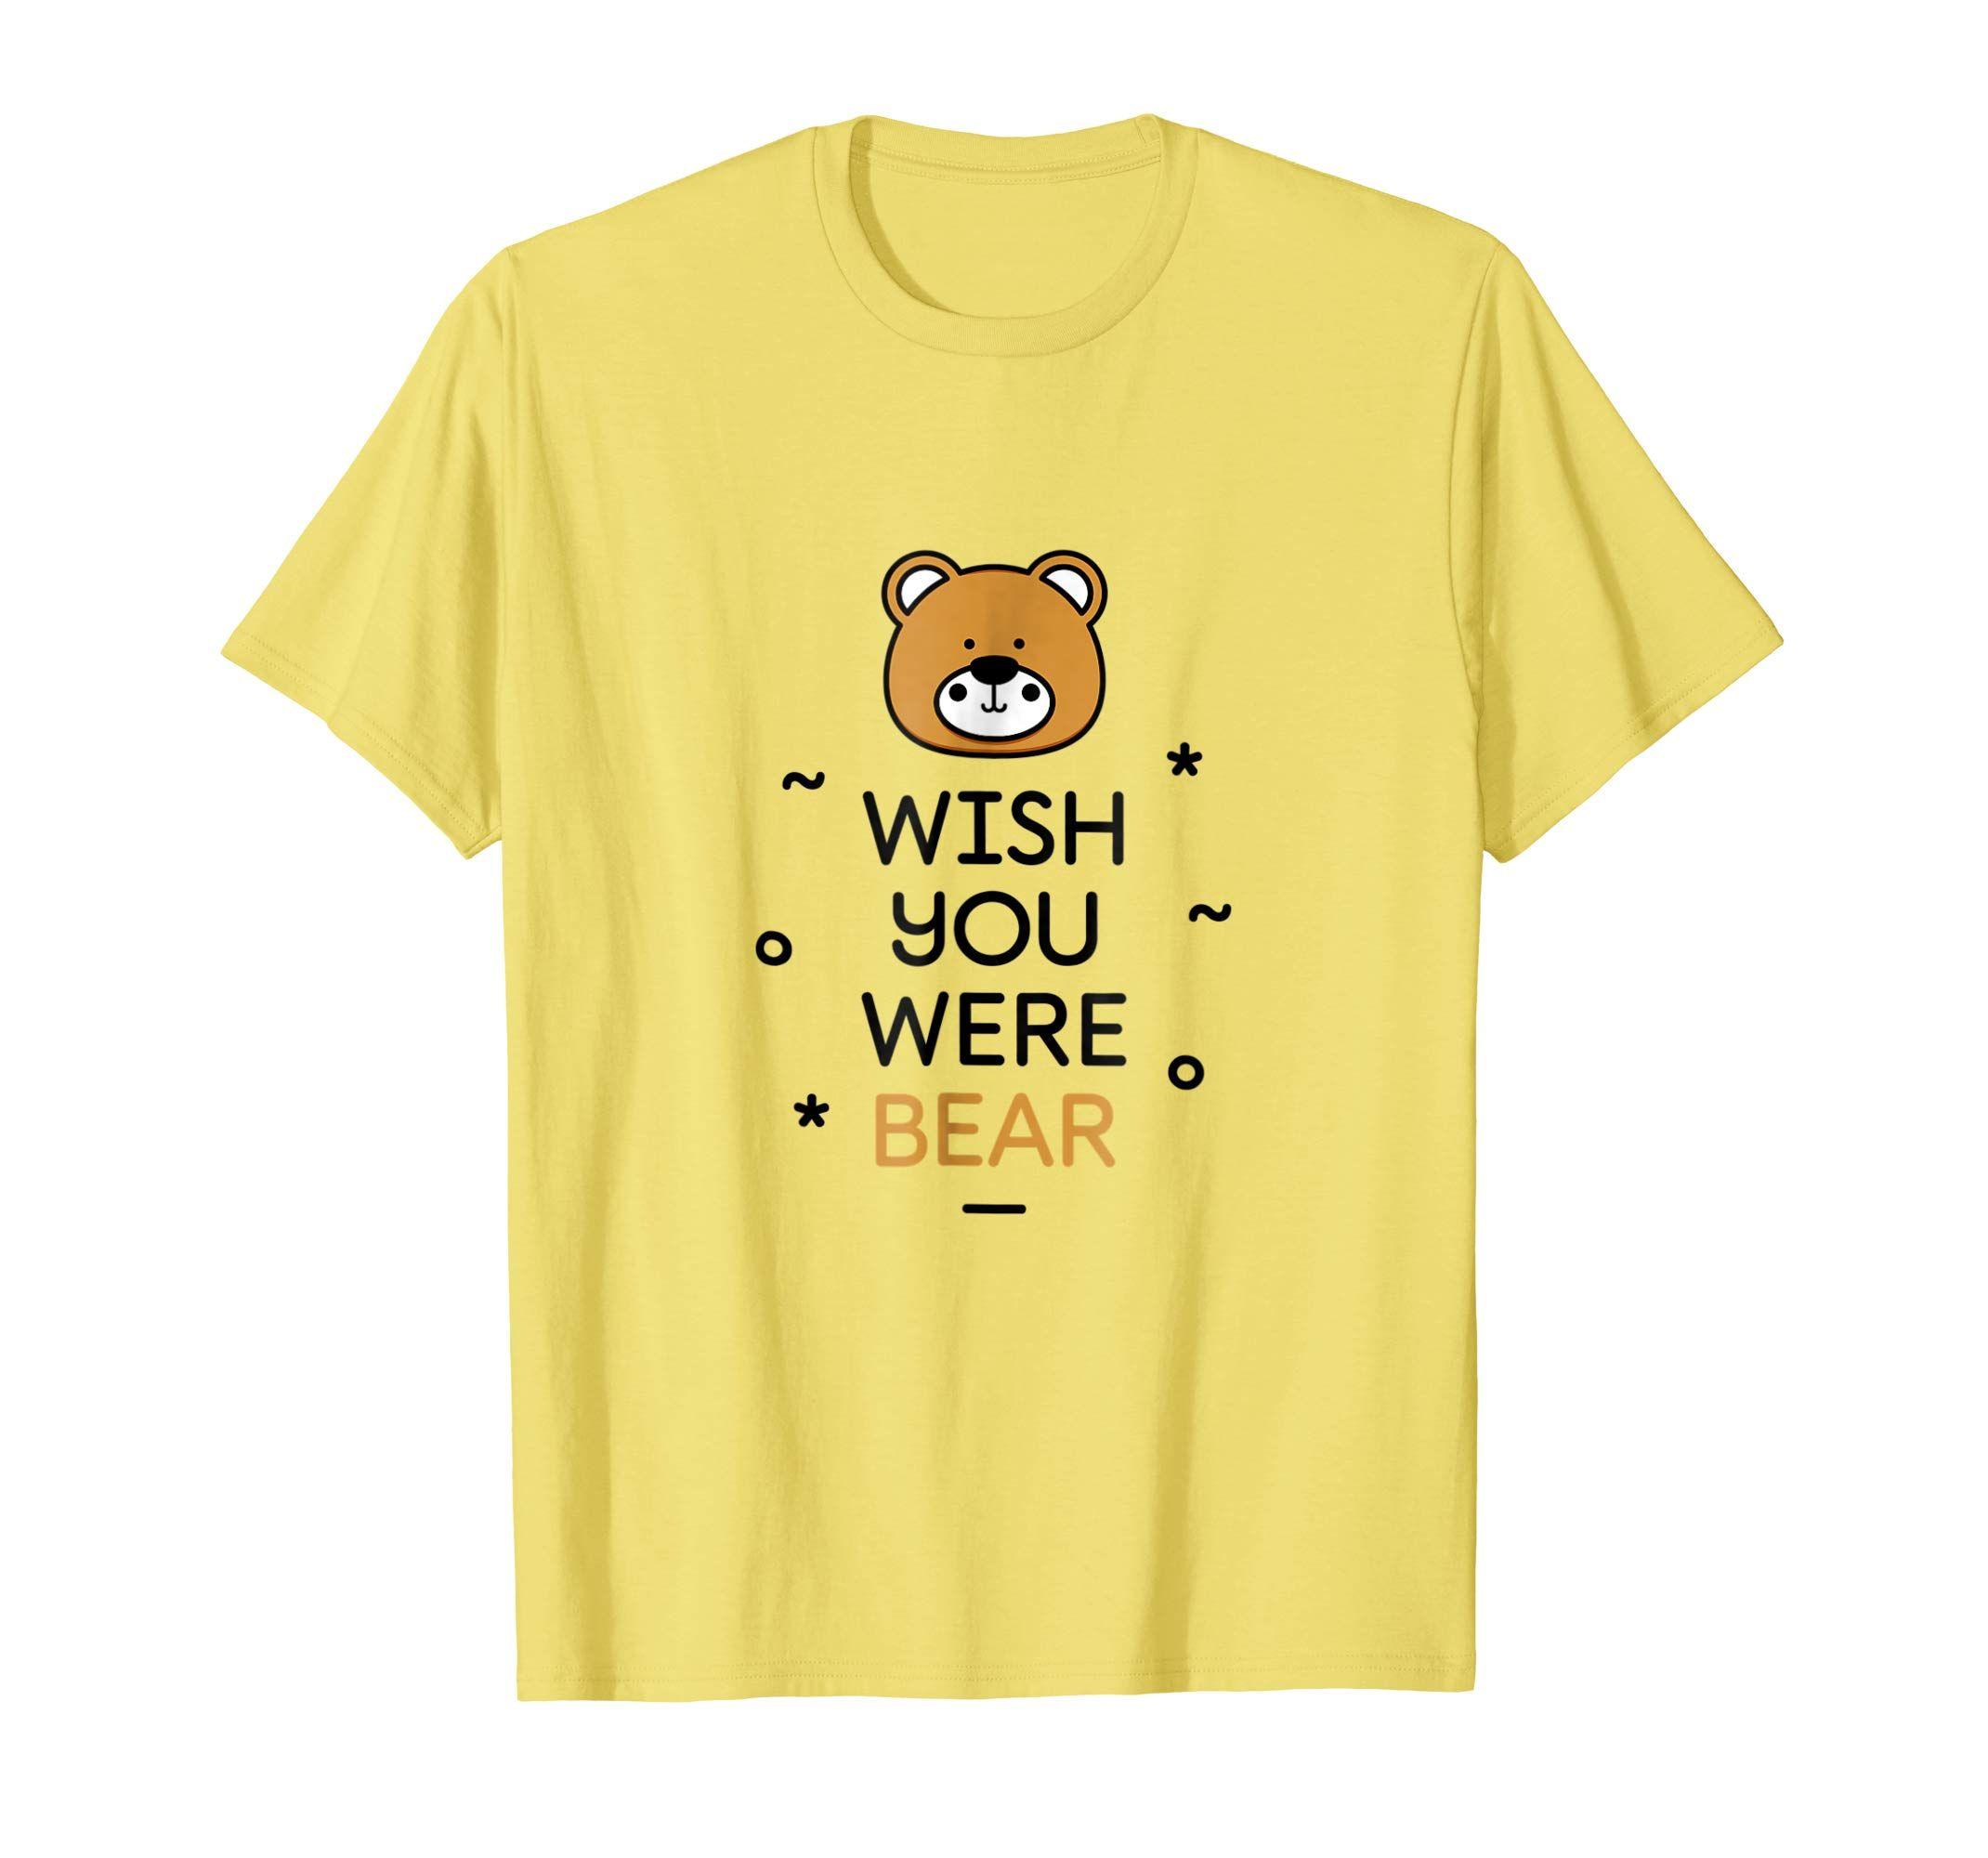 Amazon Com Wish You Were Bear Funny Quote T Shirt Clothing Best T Shirt Designs T Shirts For Women T Shirt